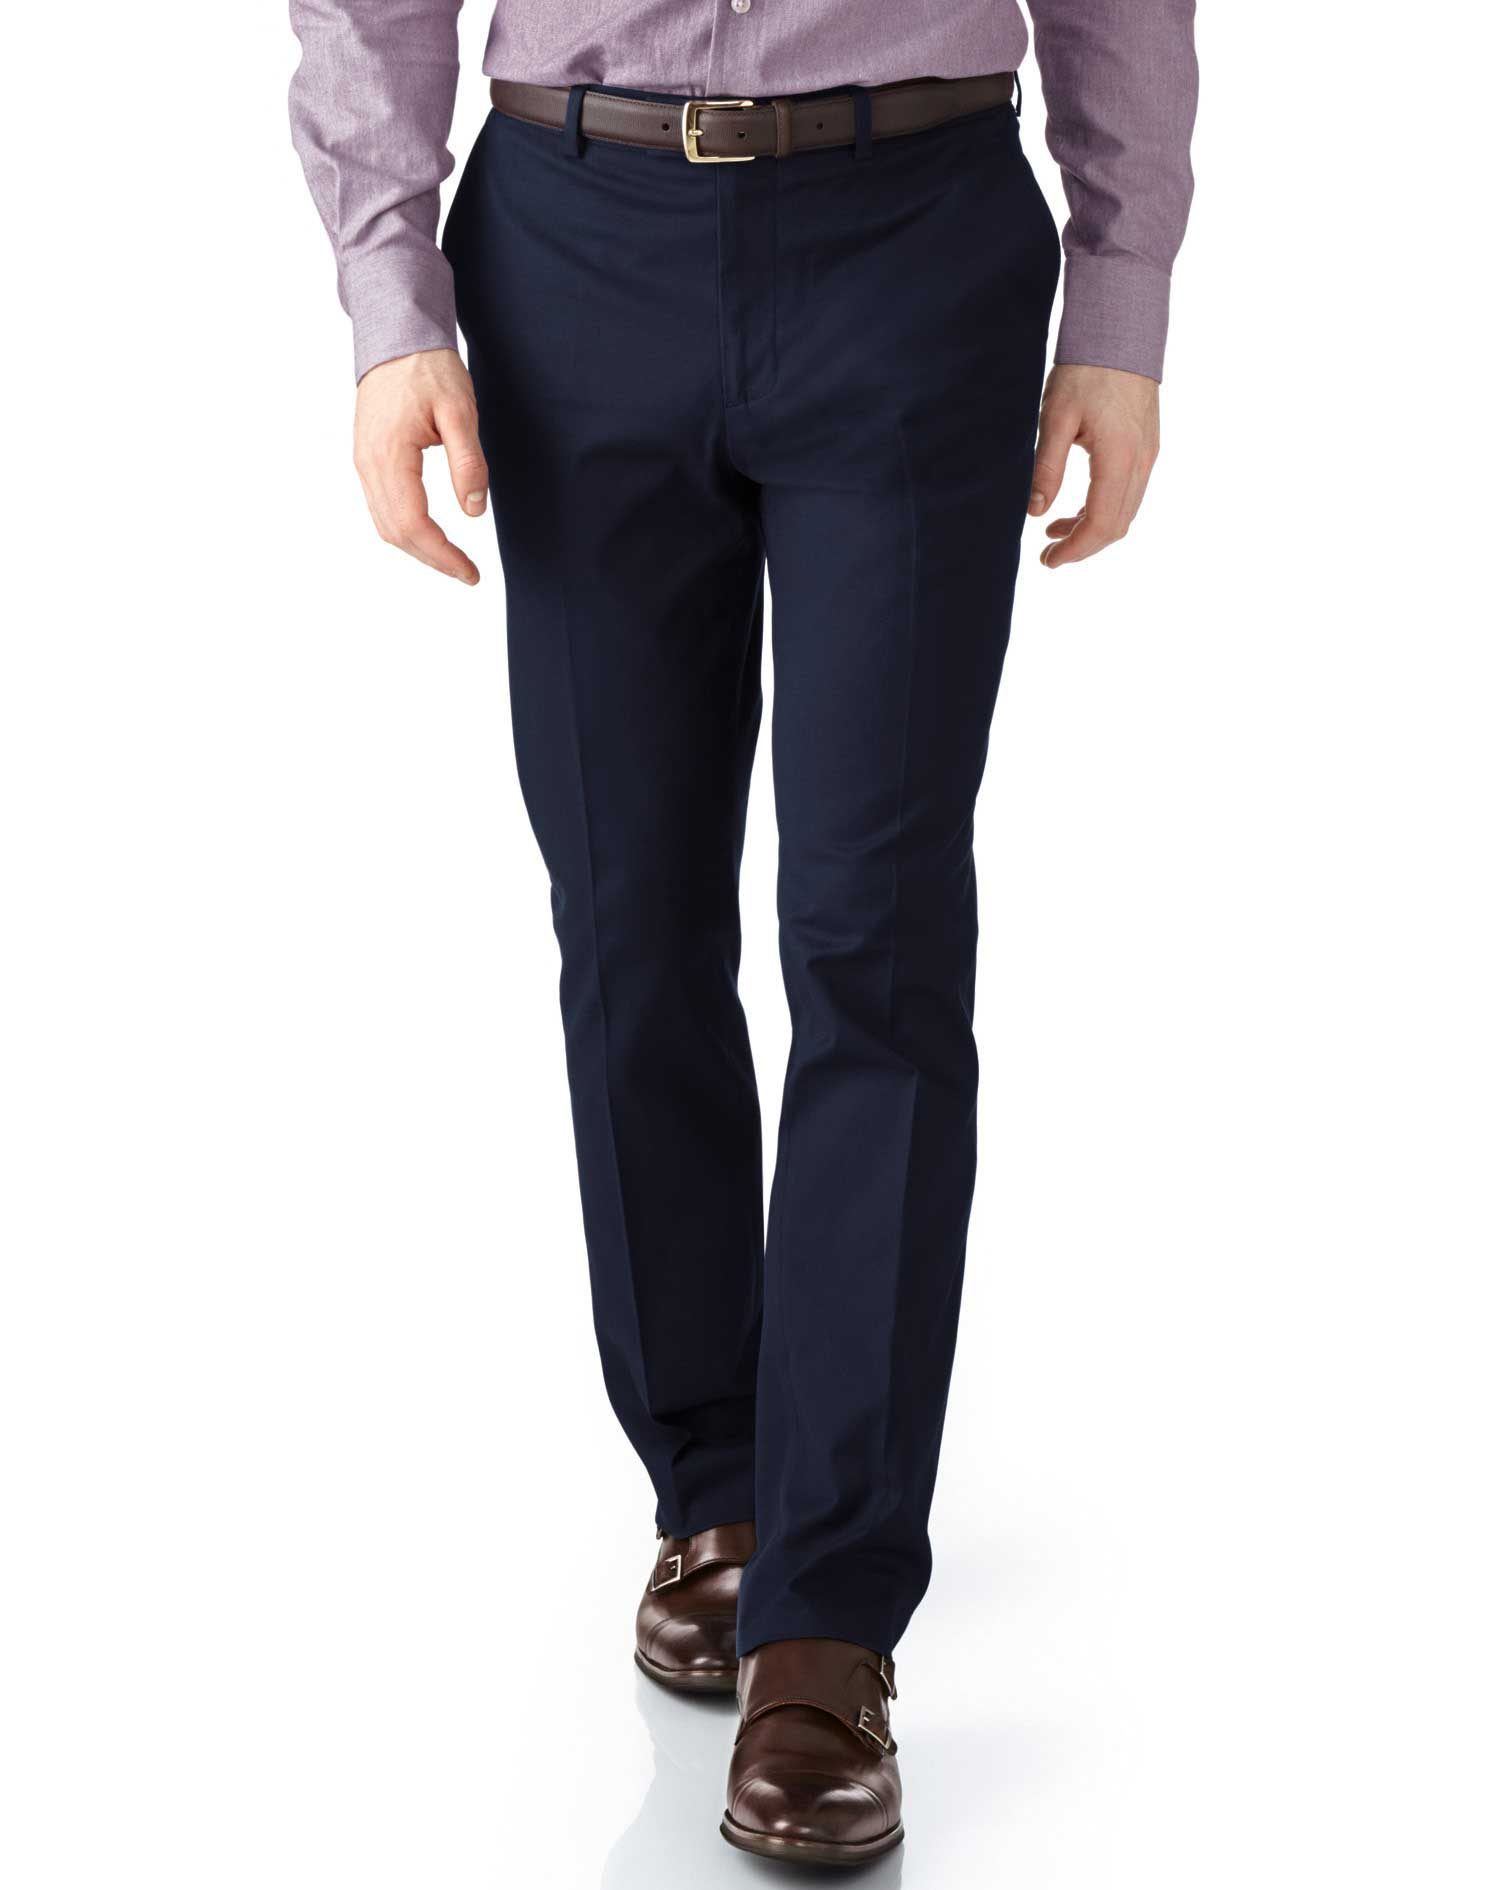 Navy Extra Slim Fit Stretch Cavalry Twill Trousers Size W36 L30 by Charles Tyrwhitt